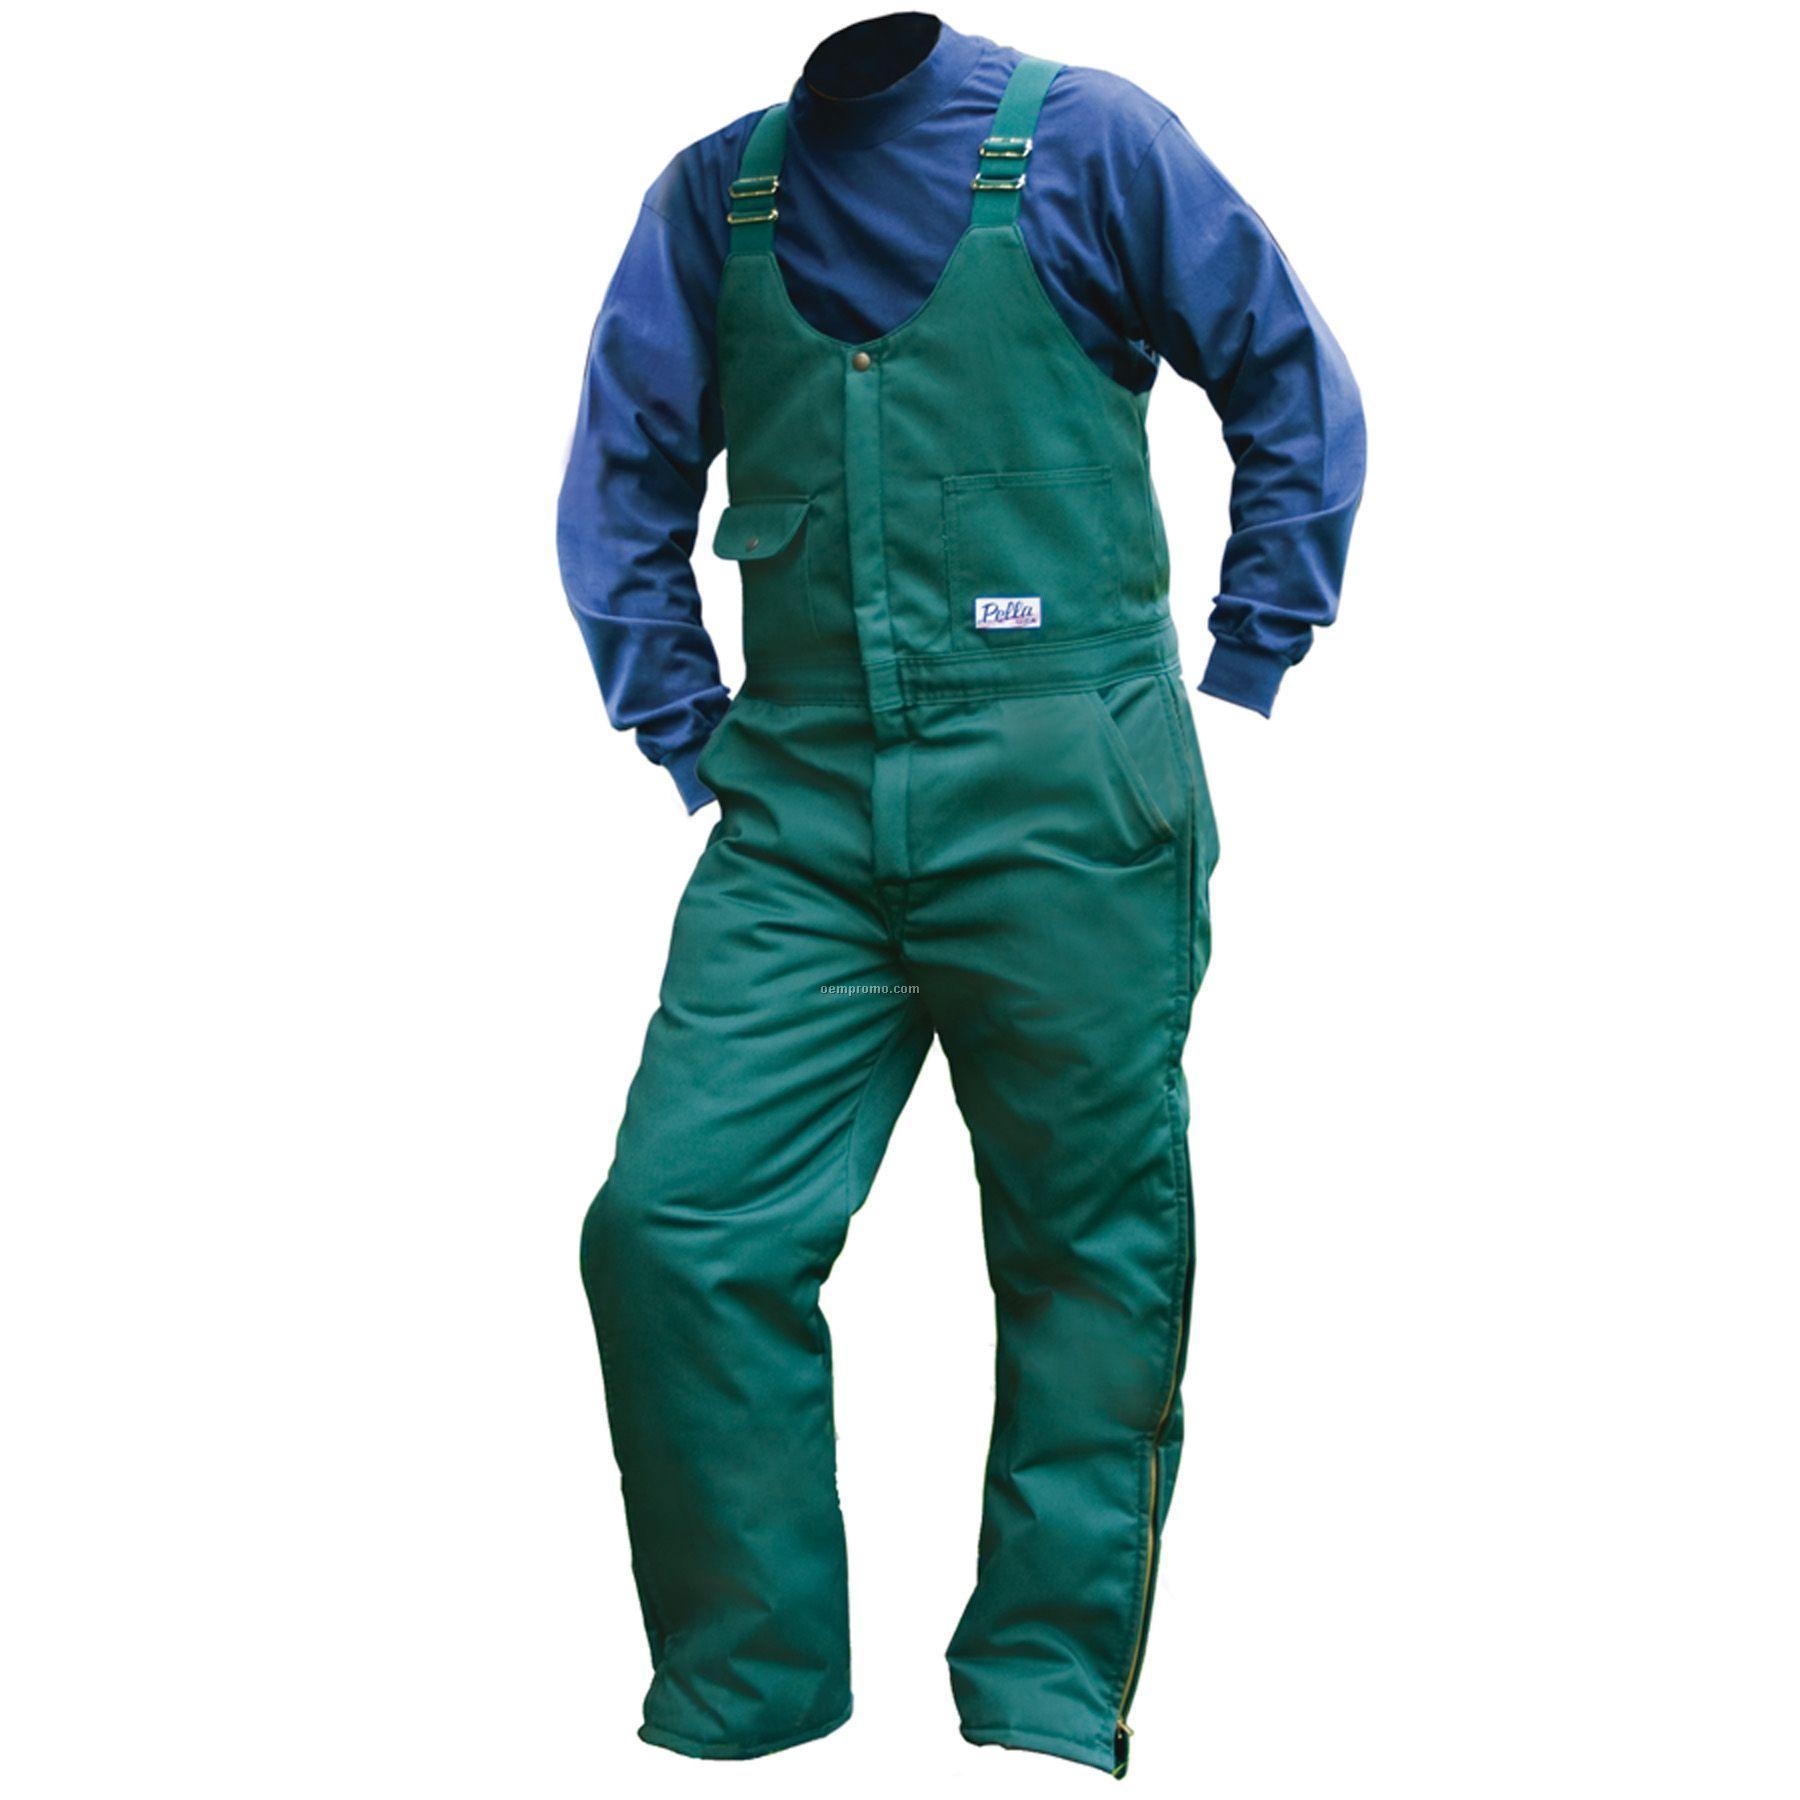 "Spruce Green Twill Insulated Bib Overall - 28"" To 42"" Waist"